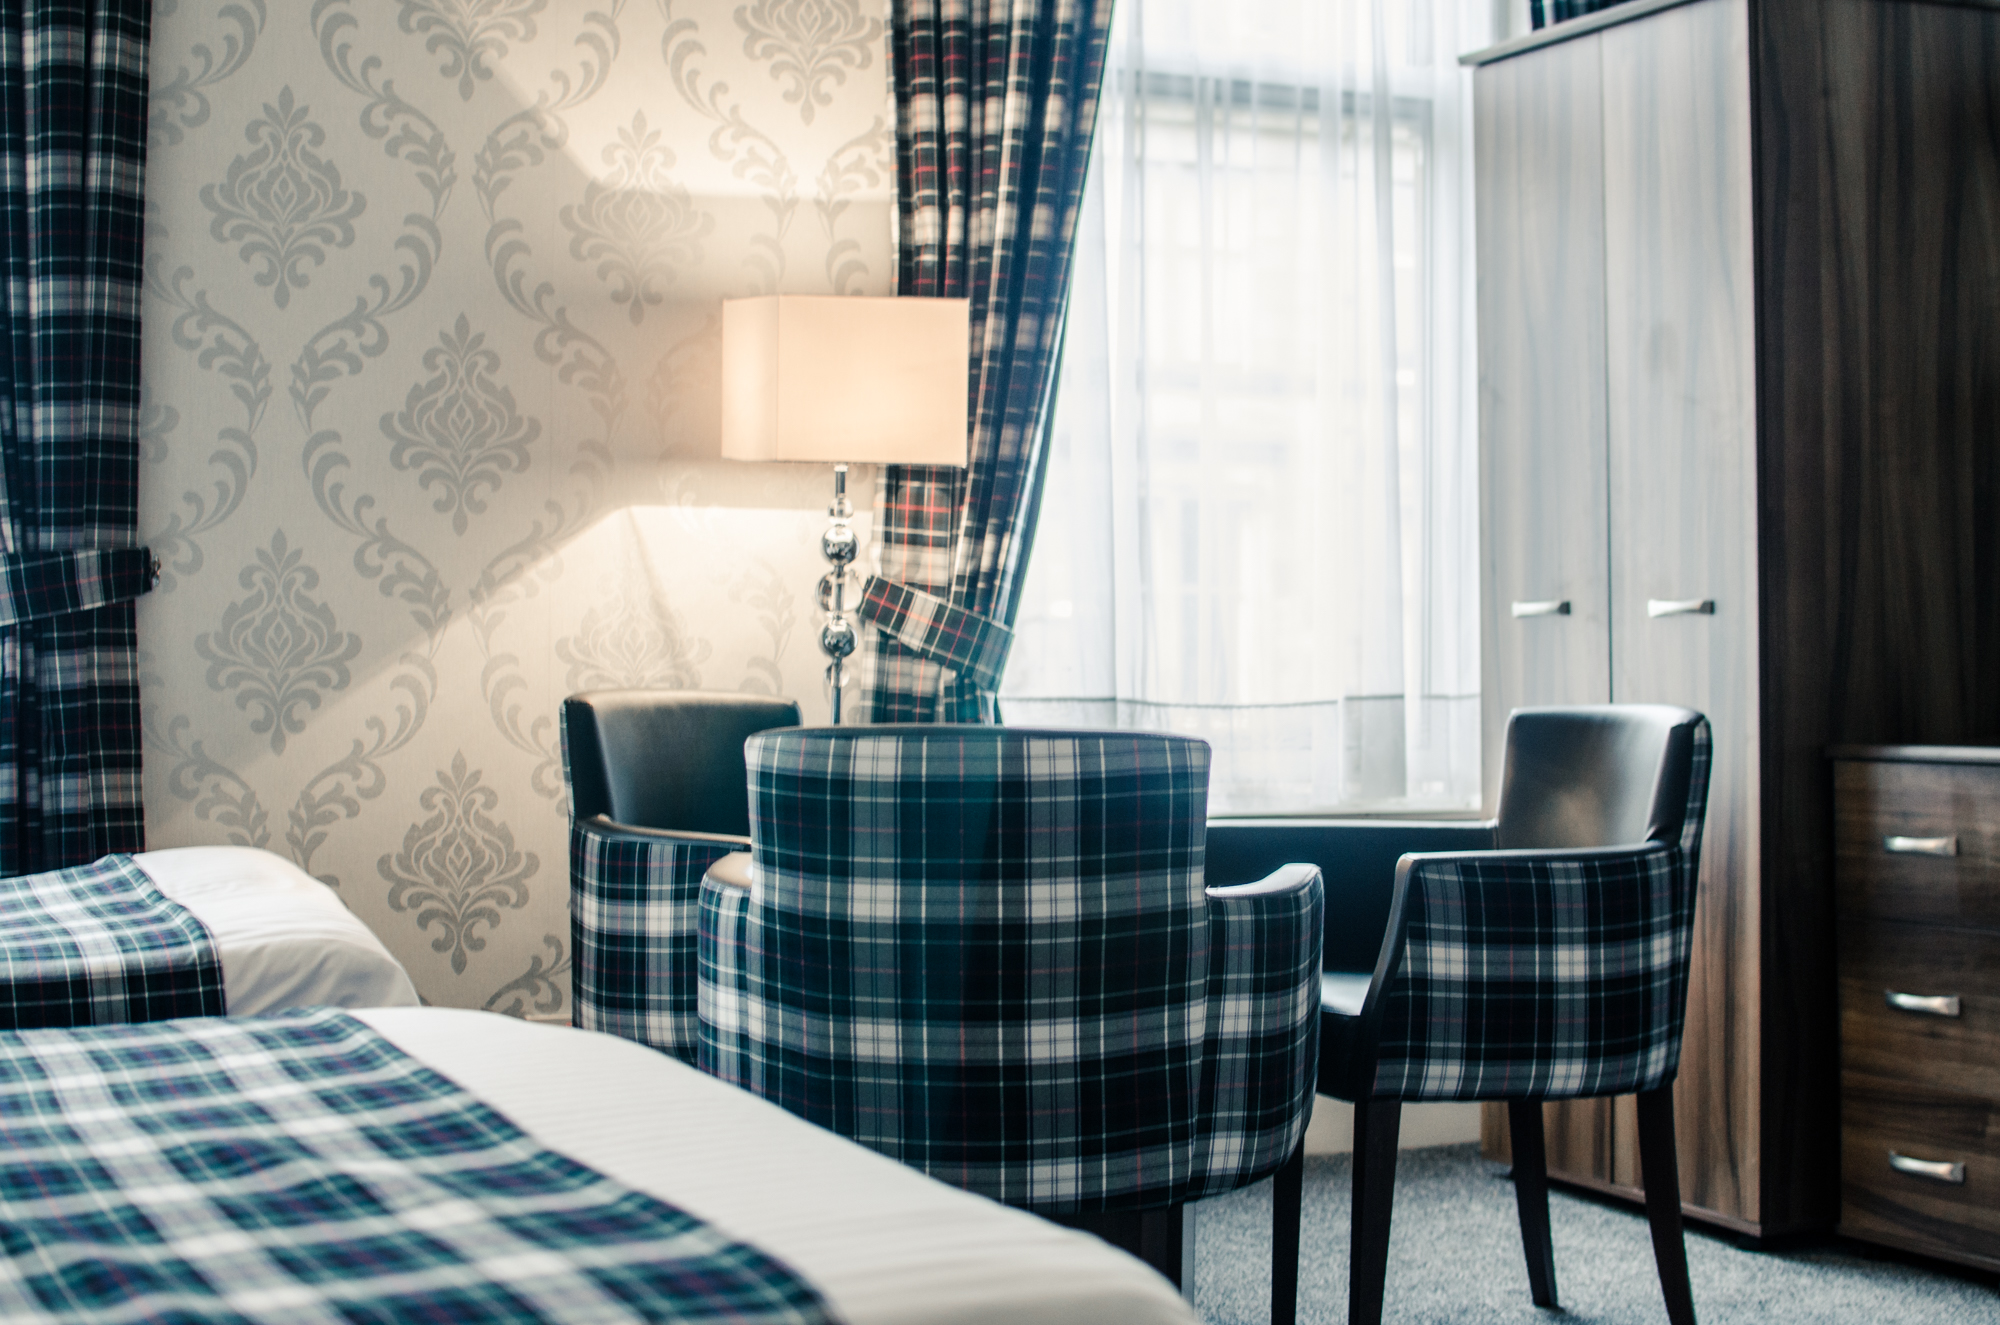 Bedroom Table - Argyll Hotel Glasgow